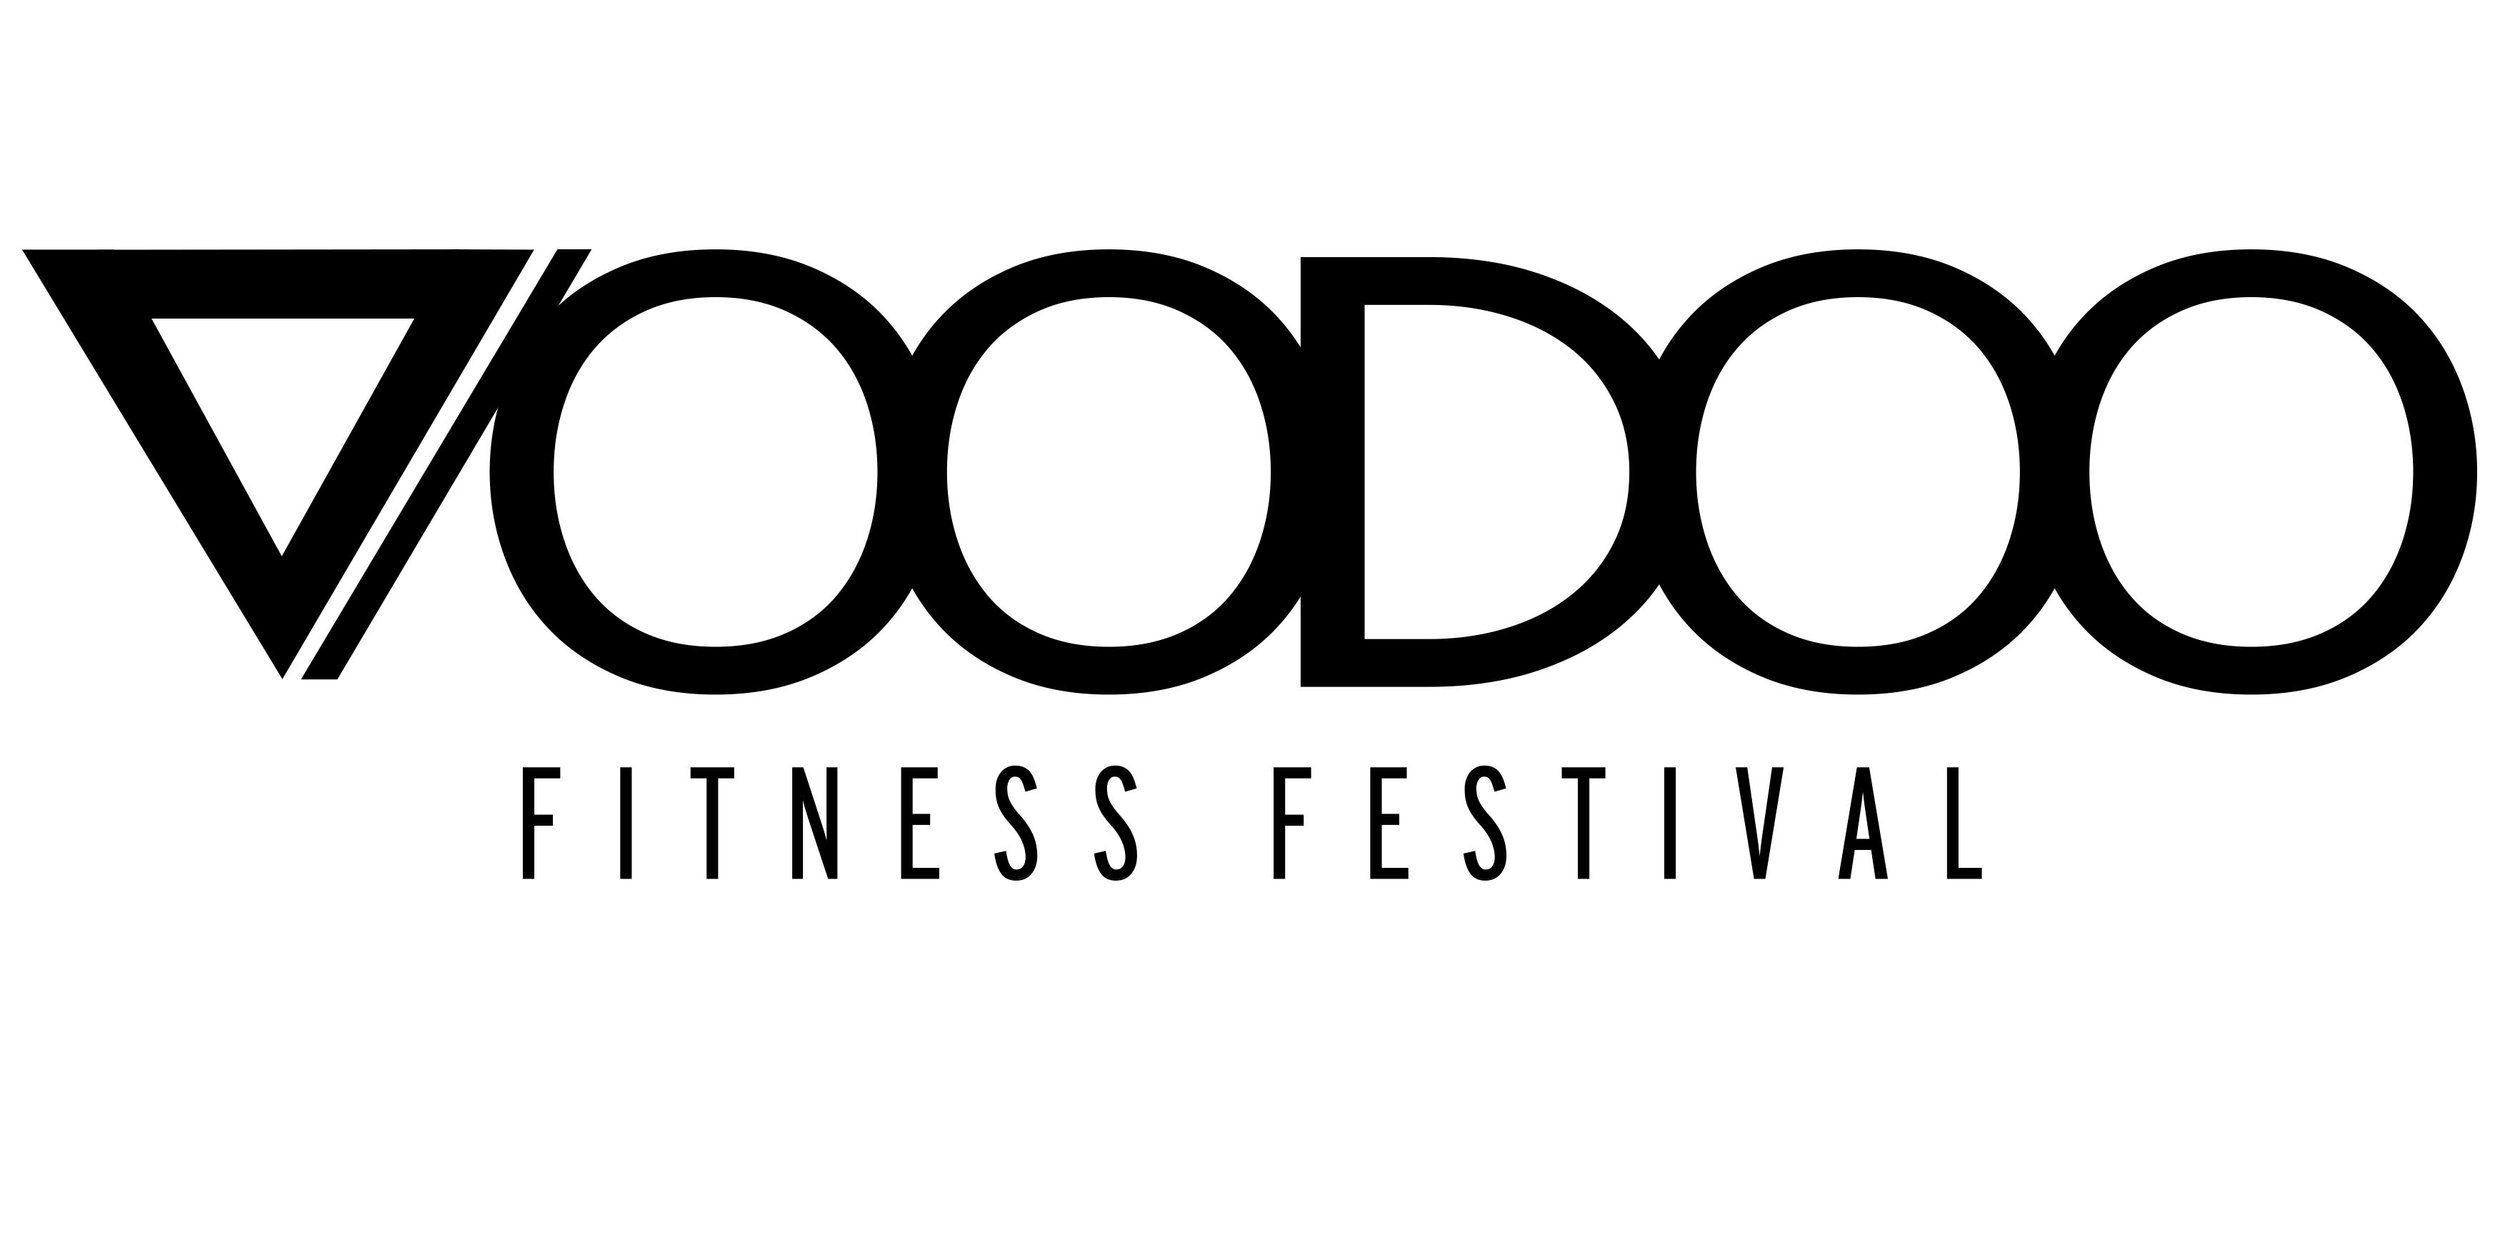 Voodoo_FitnessFest_01.jpg